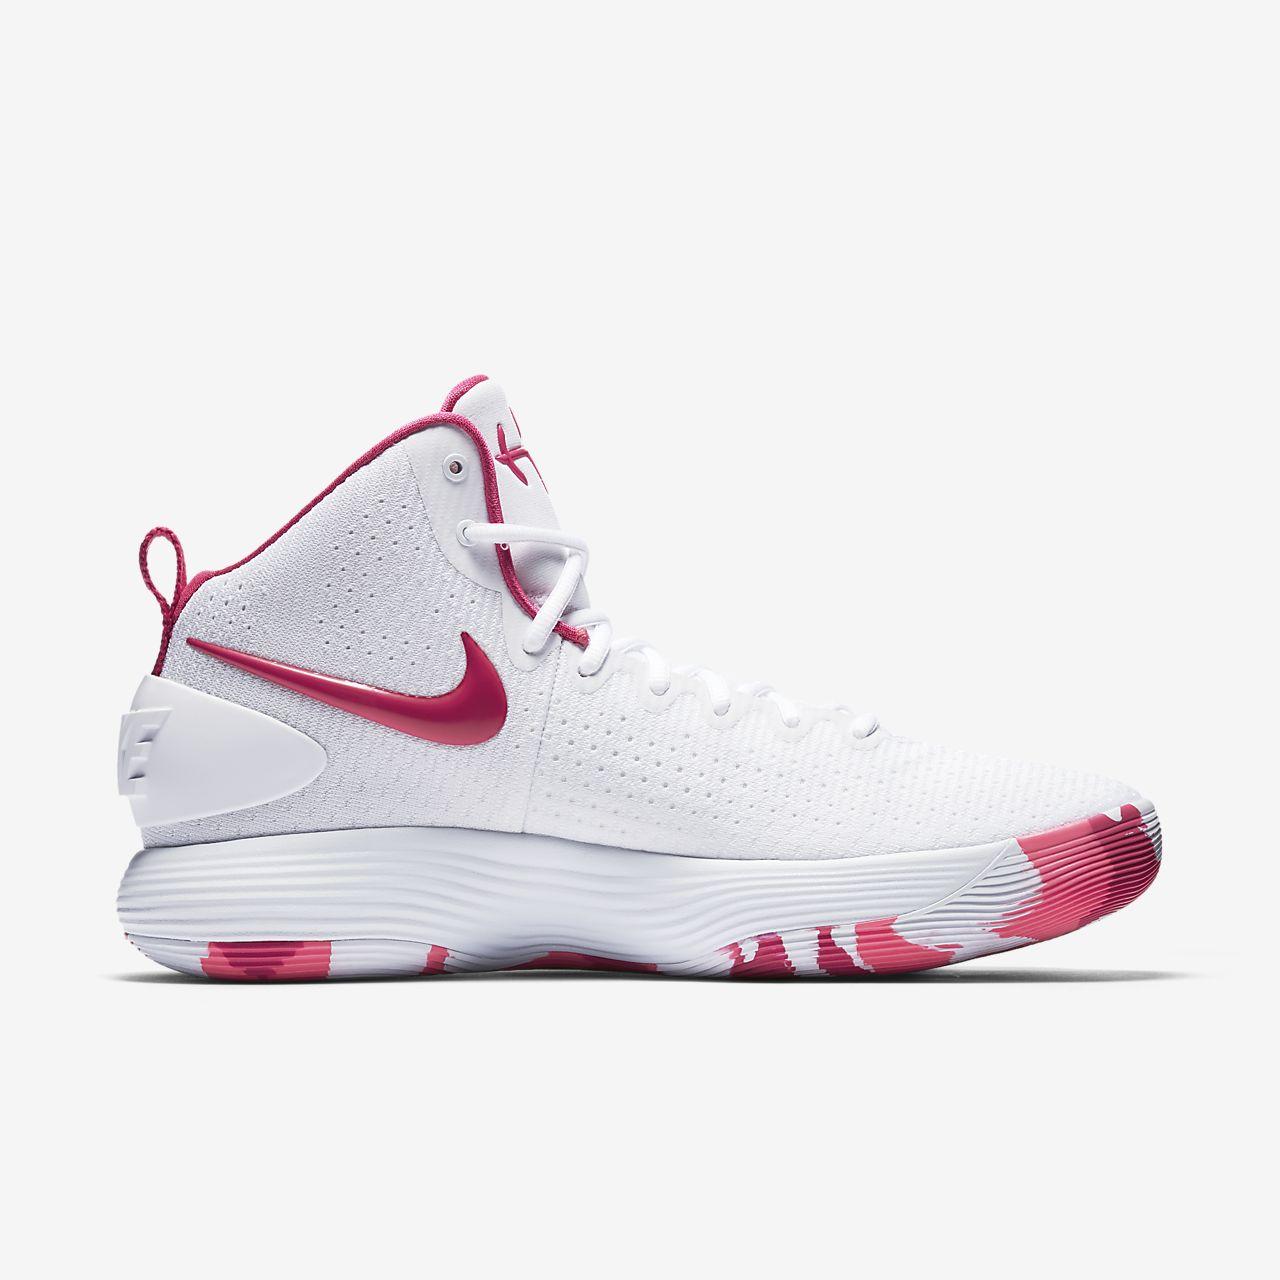 ... Nike Hyperdunk 2017 Kay Yow Basketball Shoe